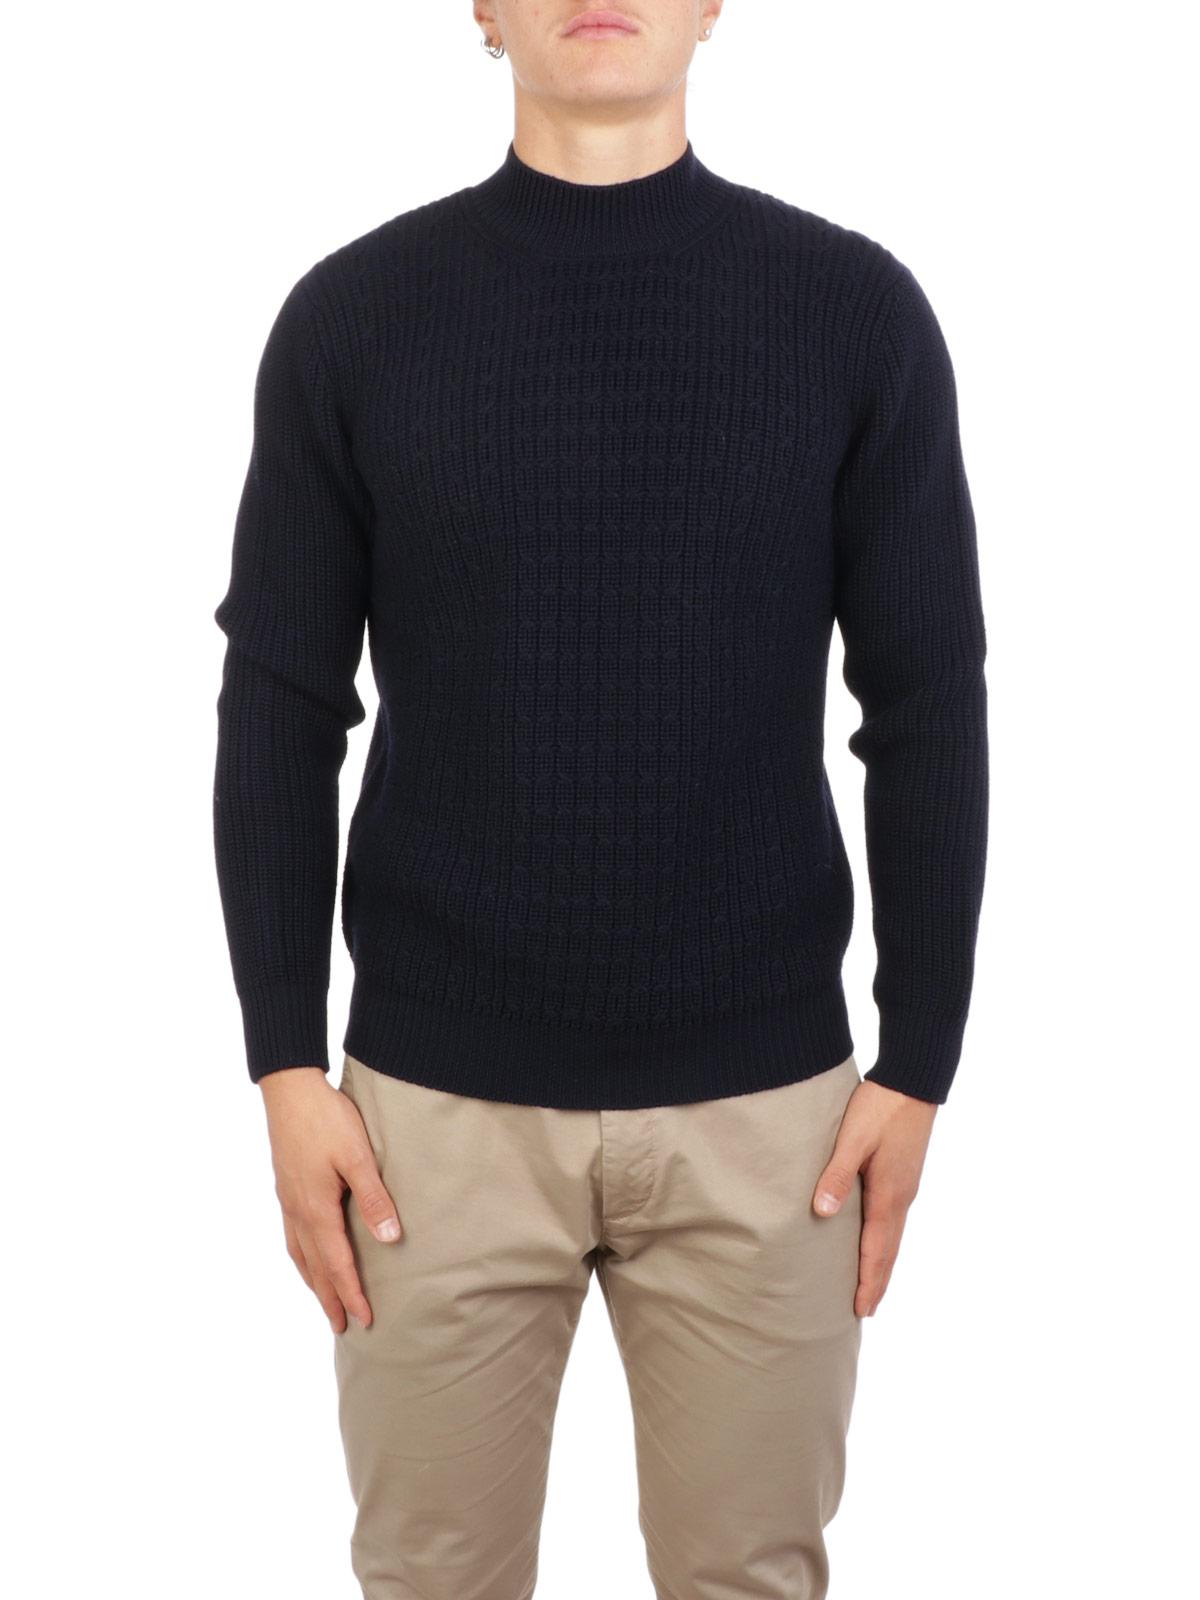 Picture of ALTEA | Men's Wool Cable Turtleneck